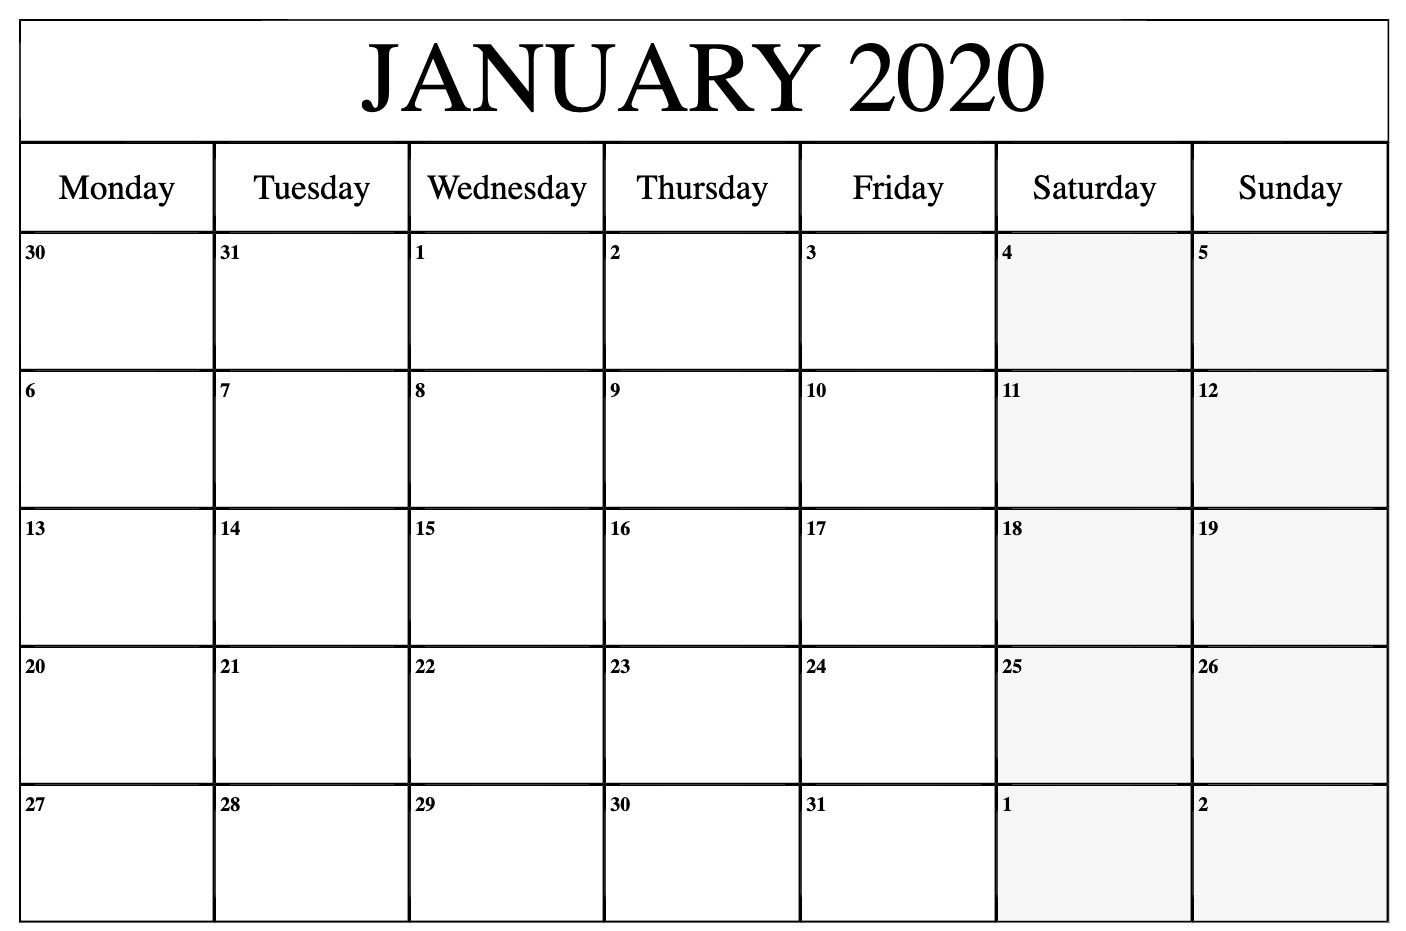 January 2020 Calendar Printable Monday | Free Printable-June August 2020 Calendar Template